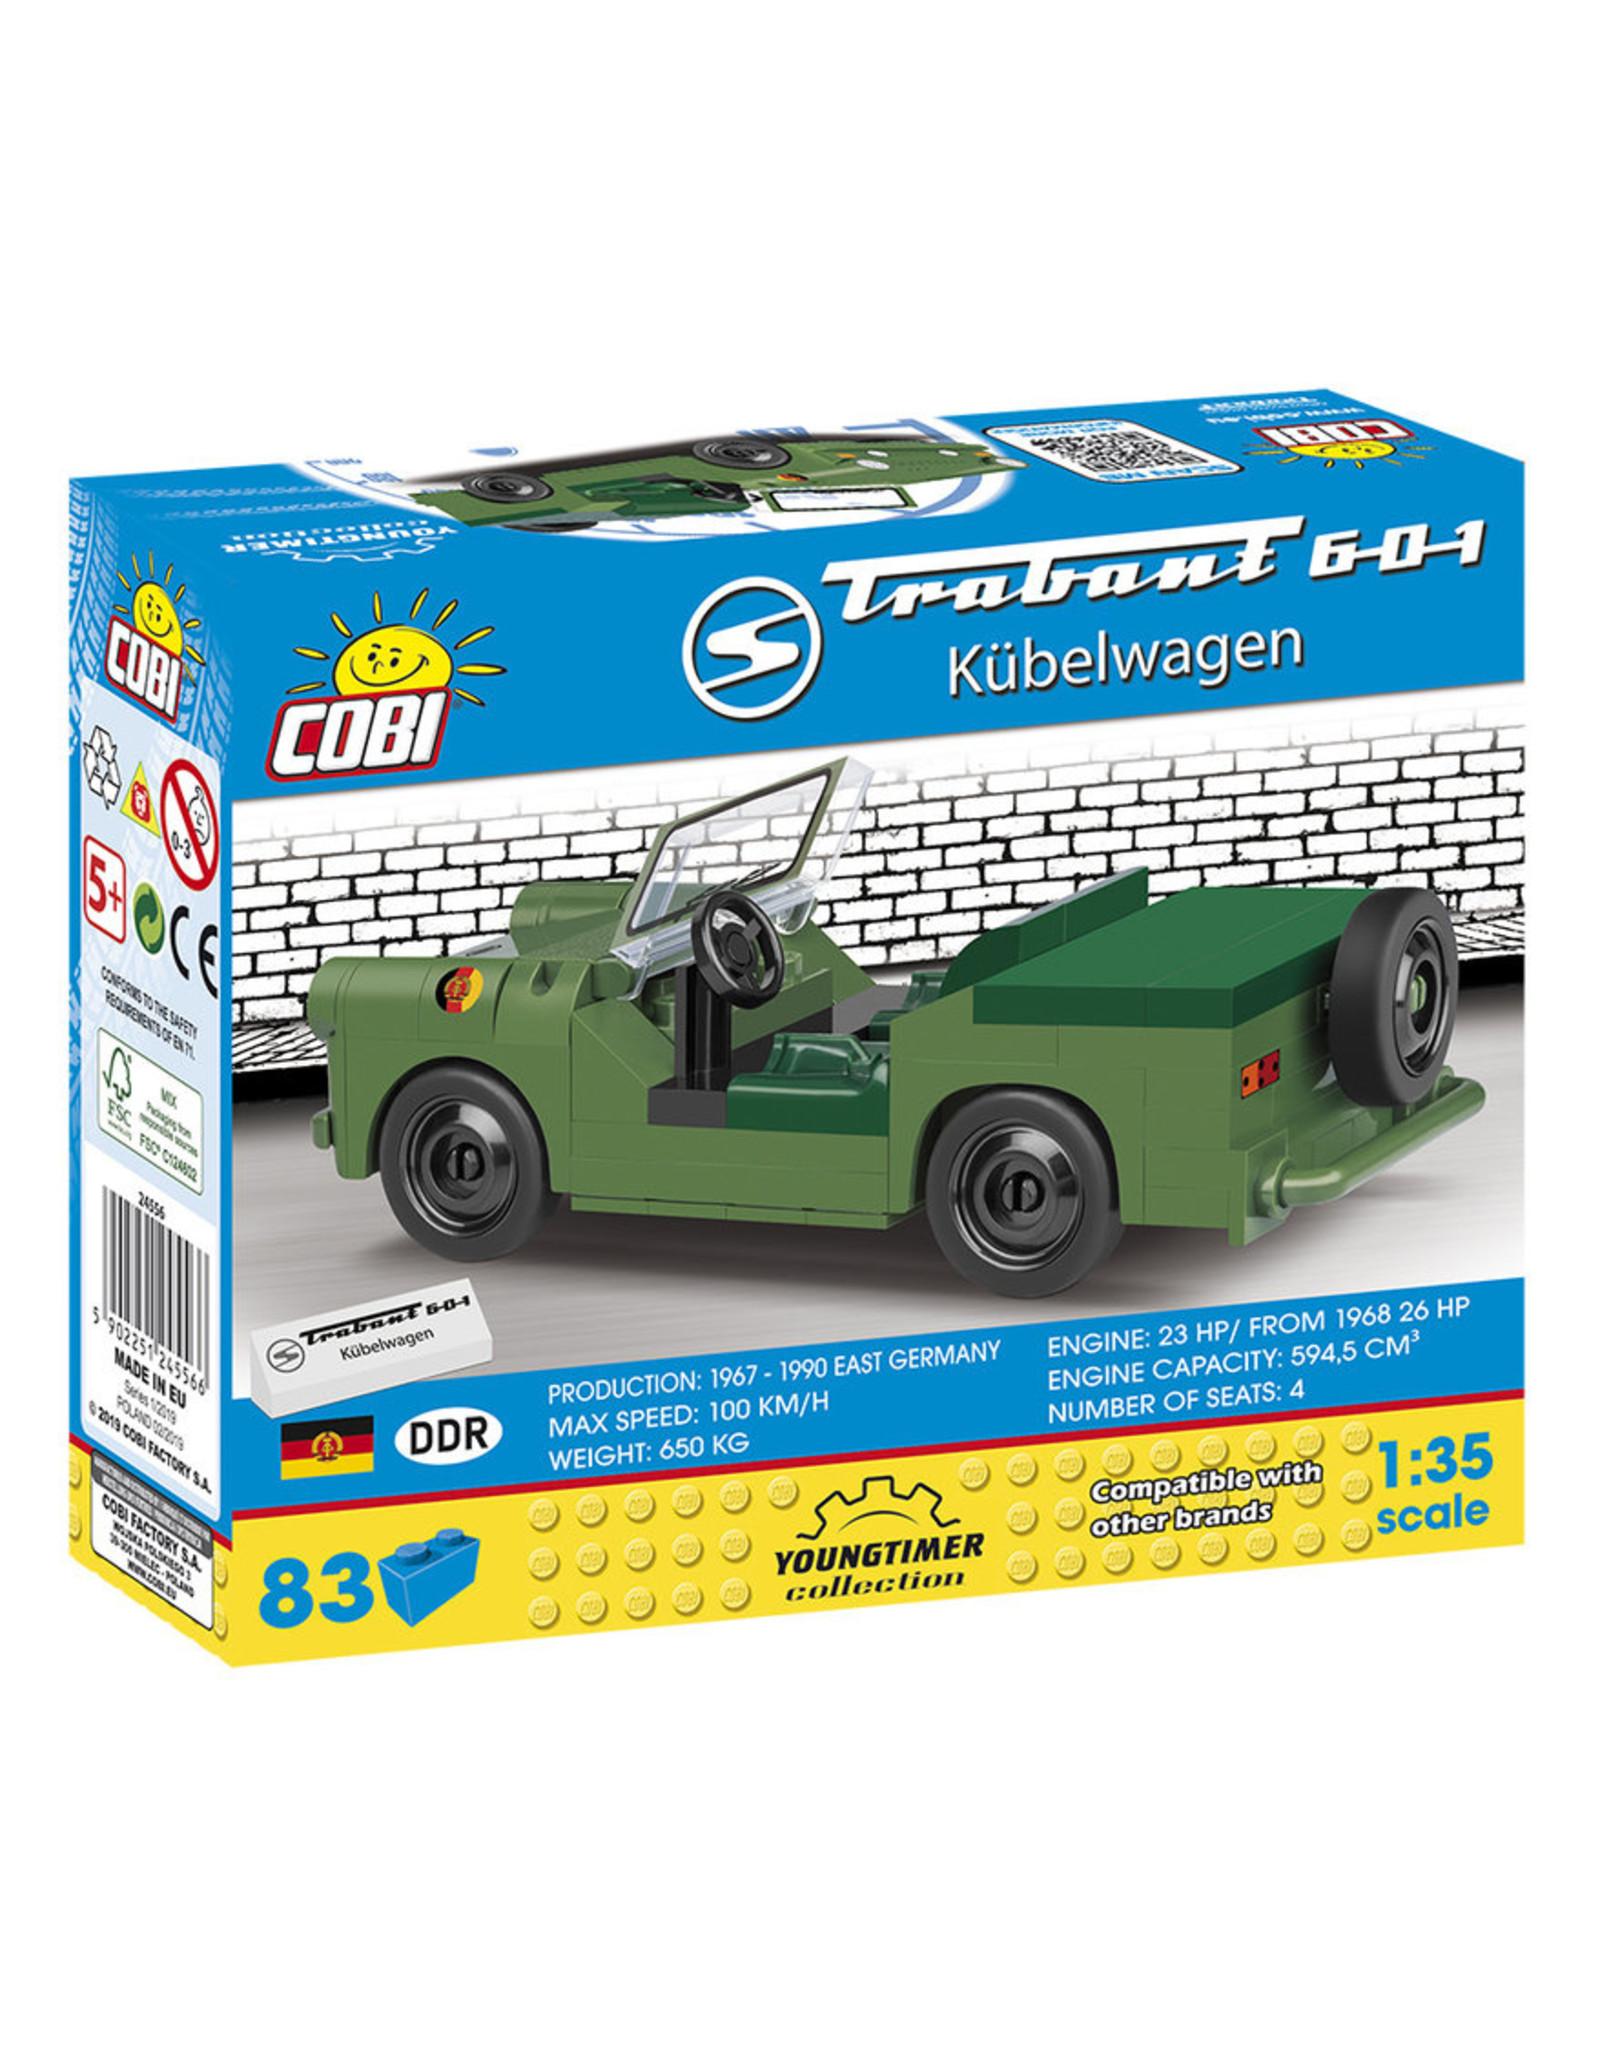 COBI COBI 24556 - Trabant 601 Kubelwagen